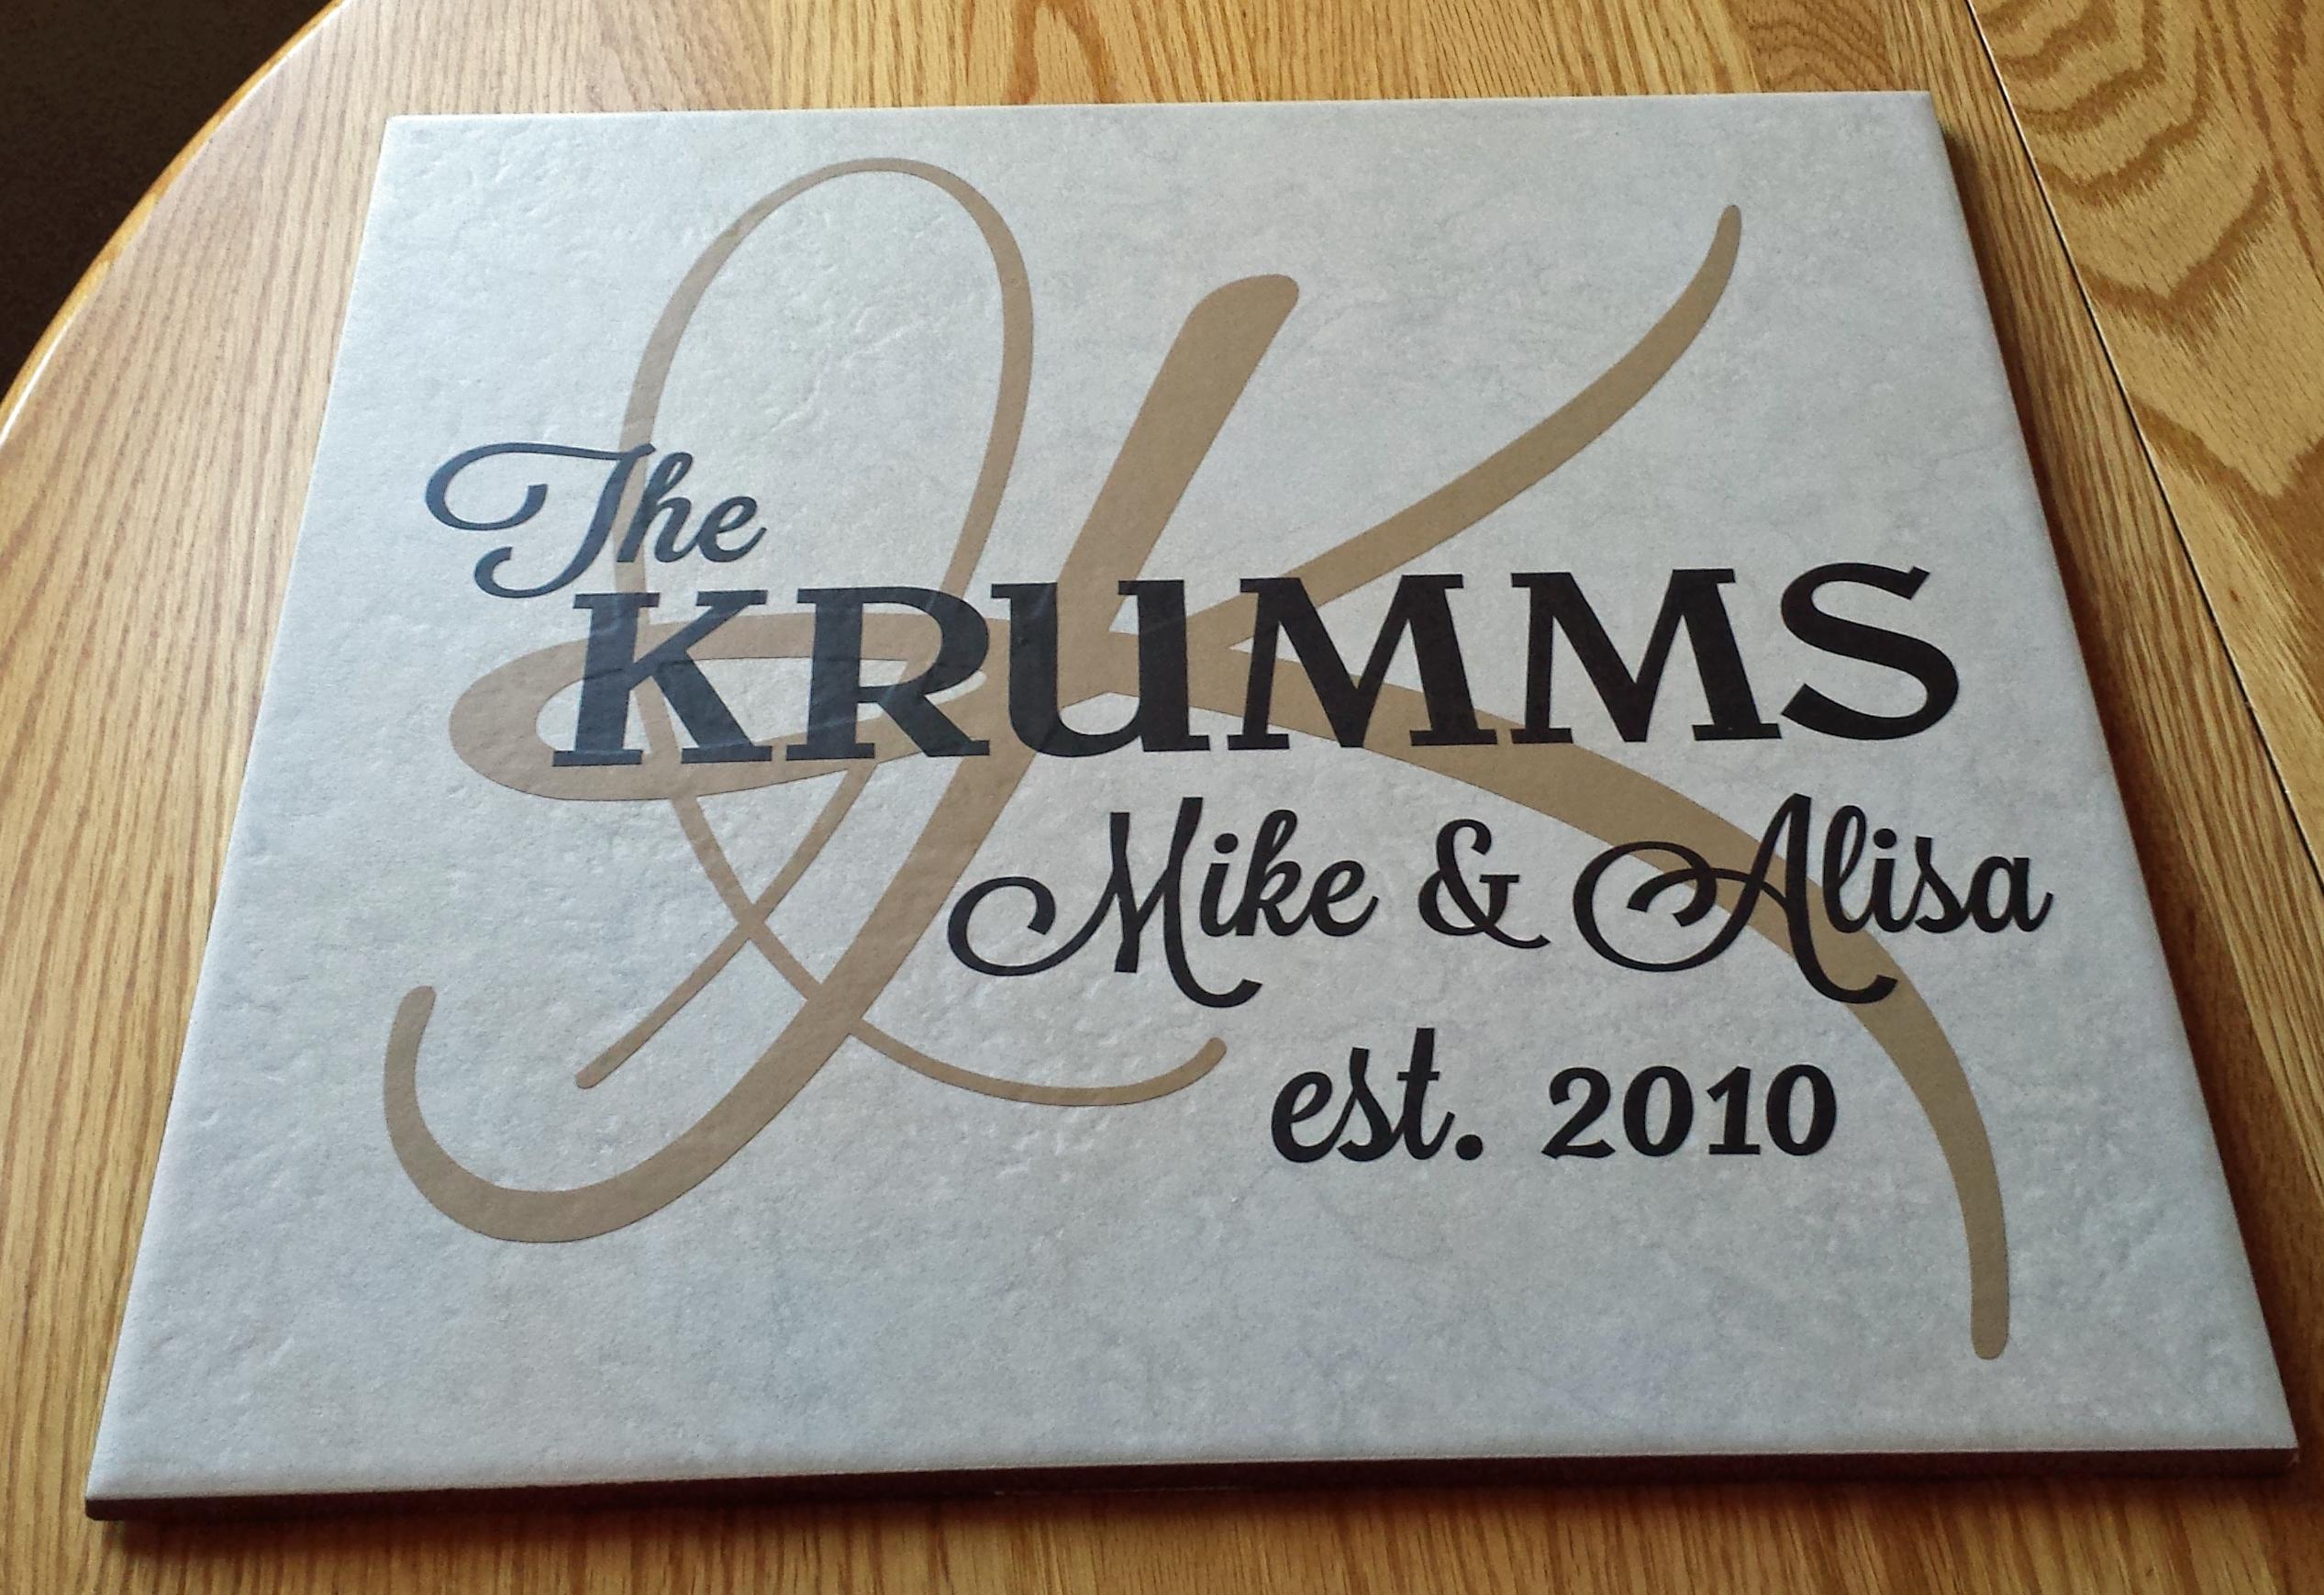 custom-tile-decal-design-family-name-and-date-krumms-wd309.jpg